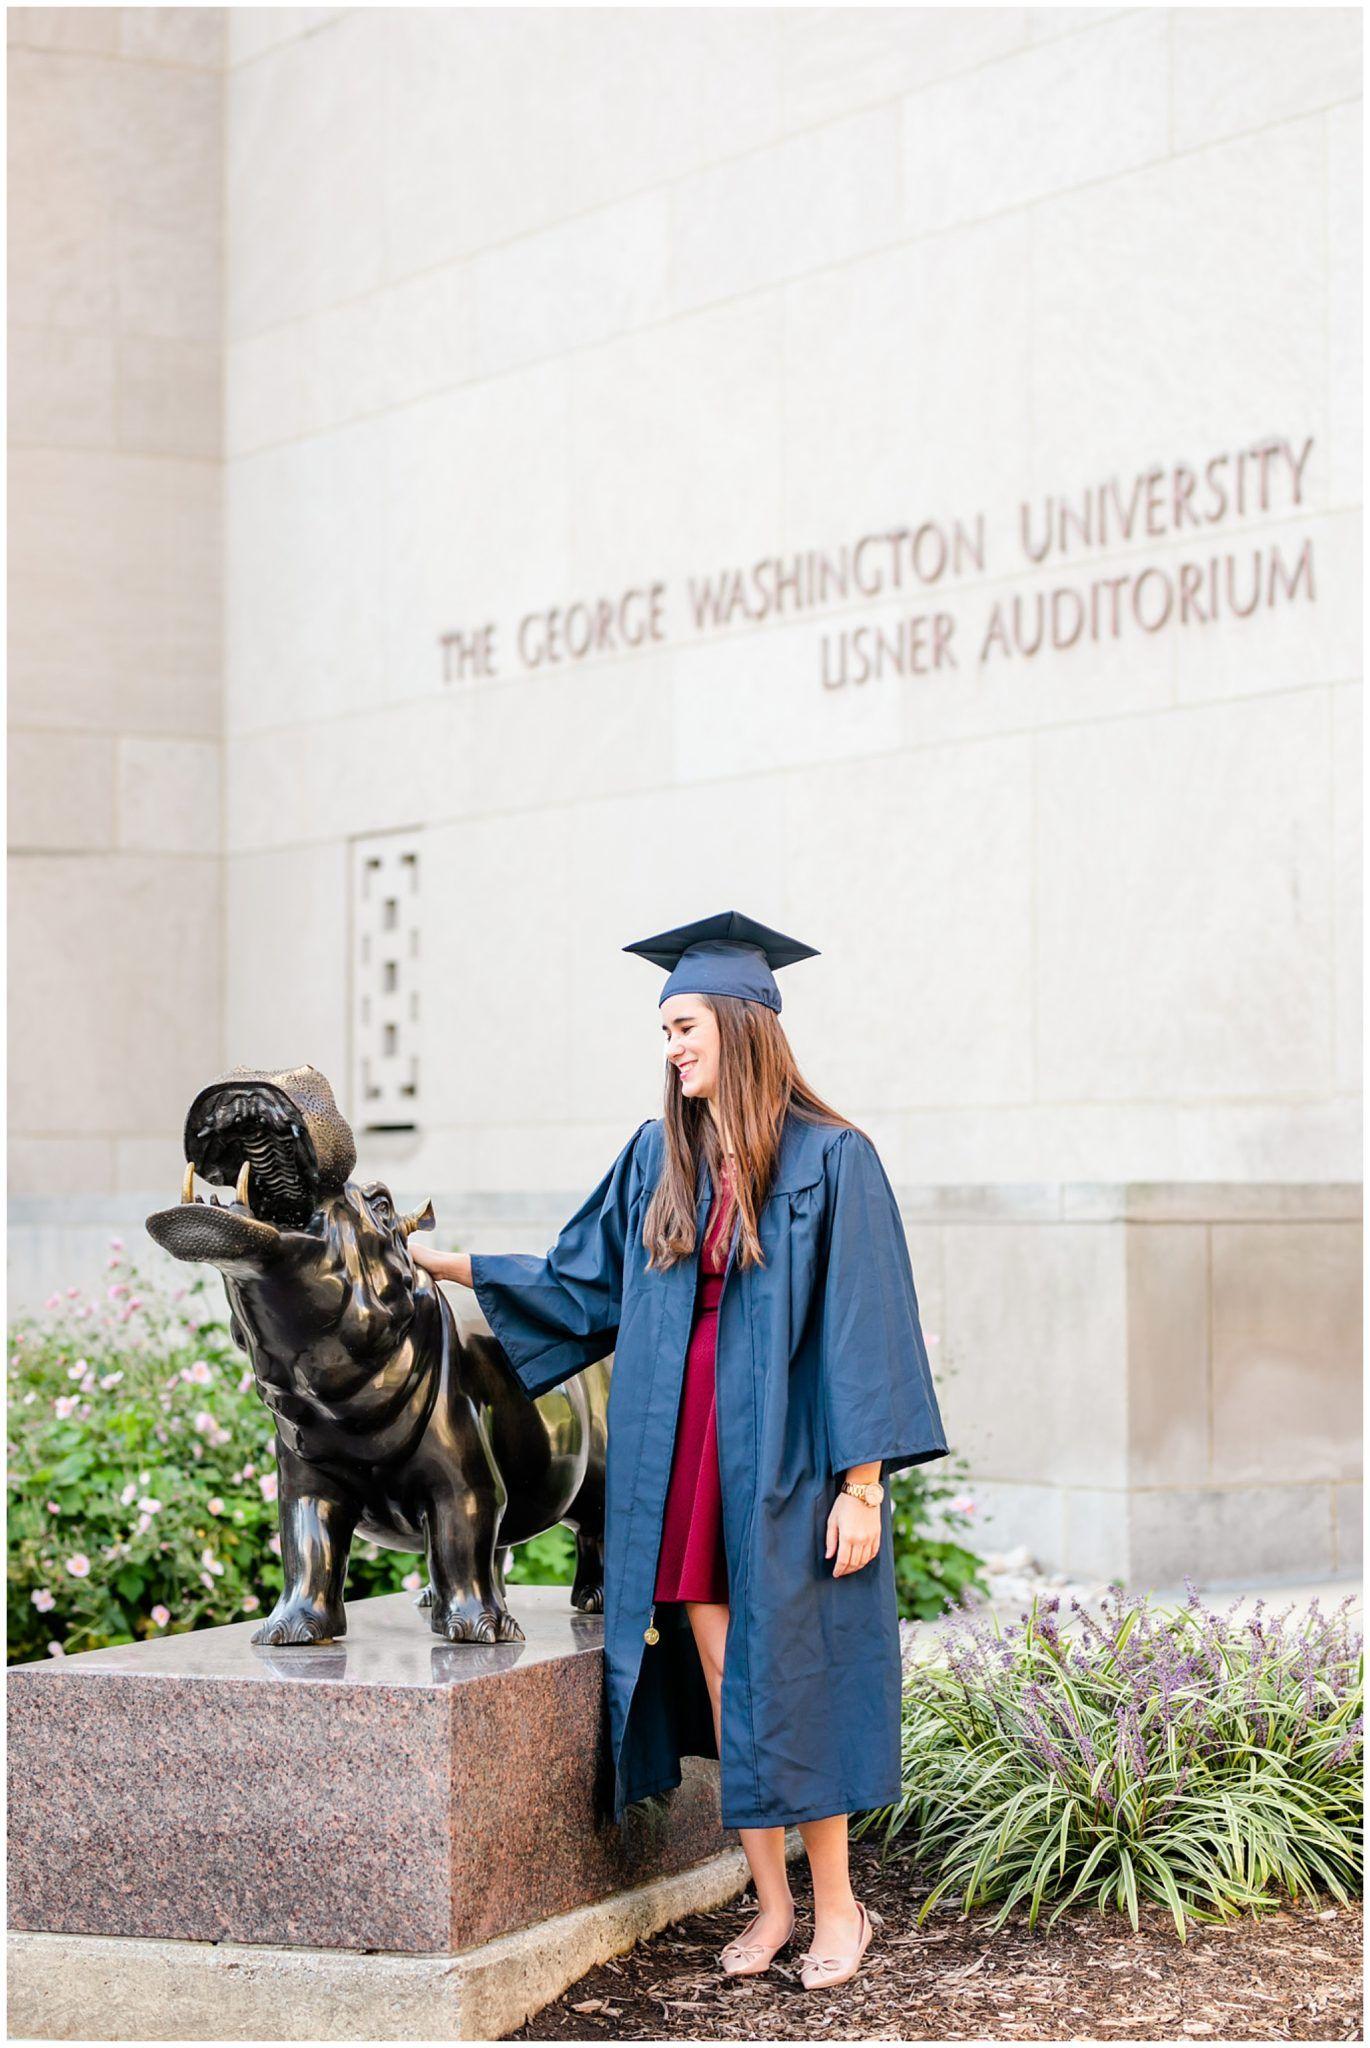 Gw University Graduation Photos Showit Blog In 2021 University Graduation Graduation Photos George Washington University